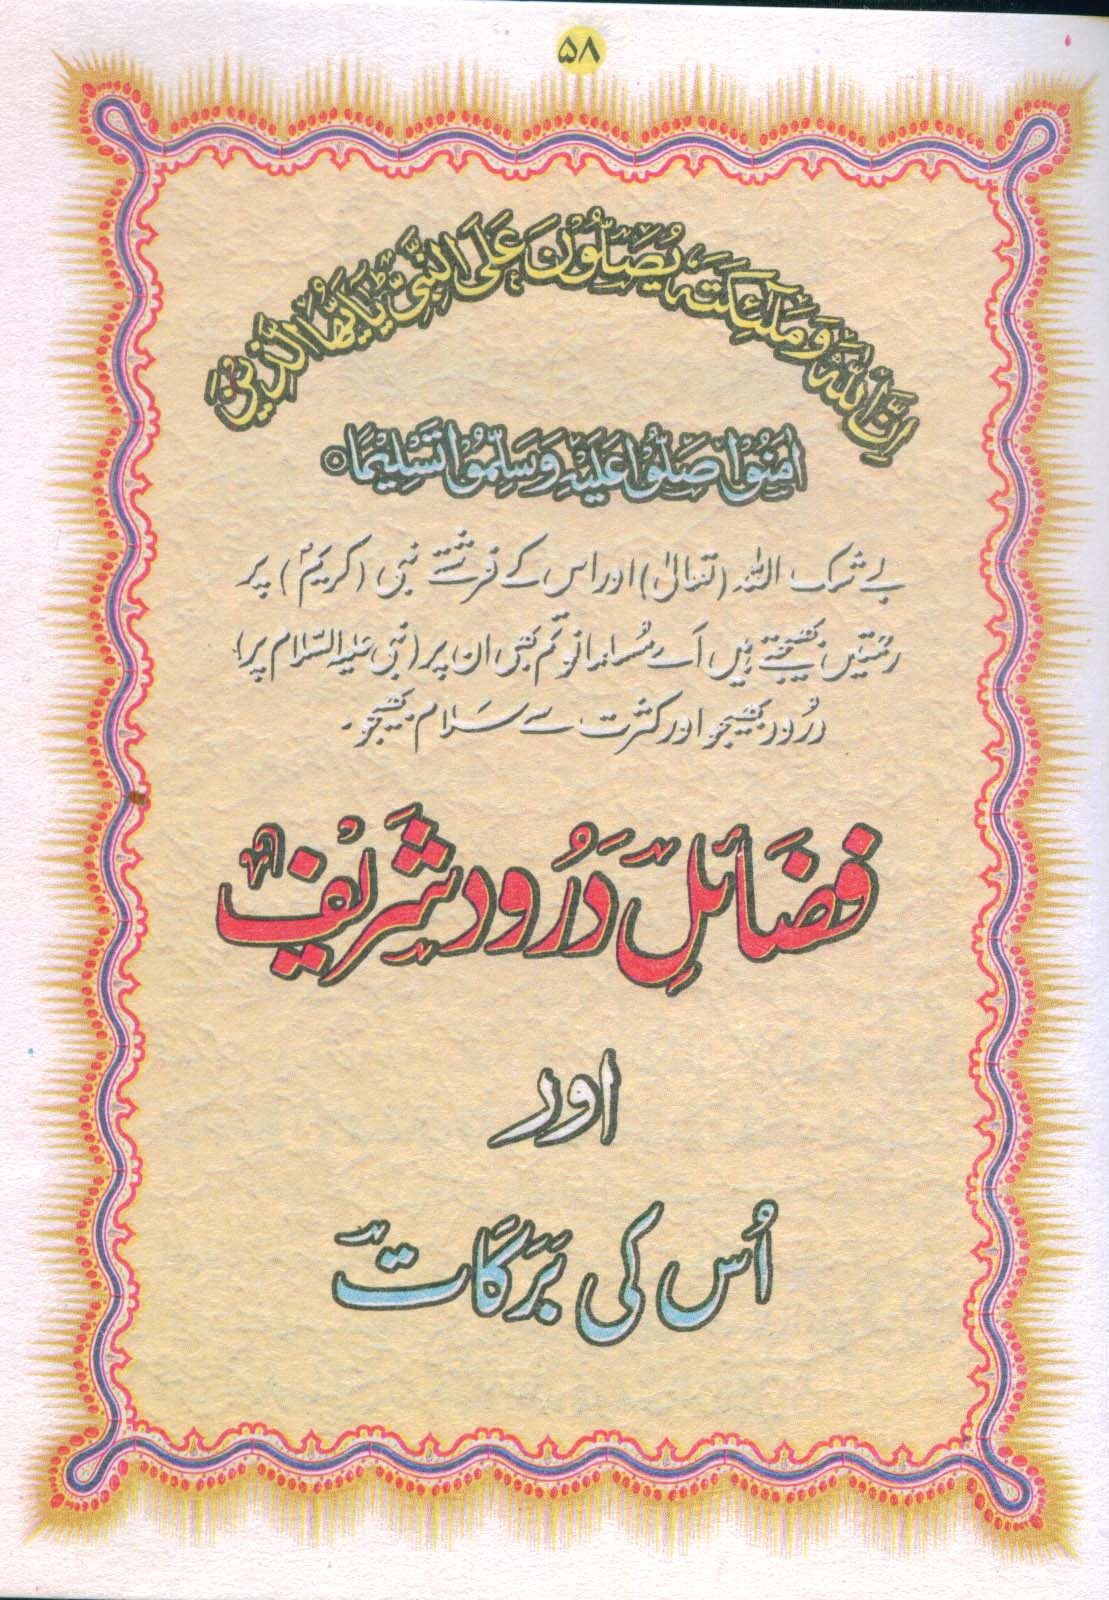 Drood Sharif Urdu Wazaif Amliyat